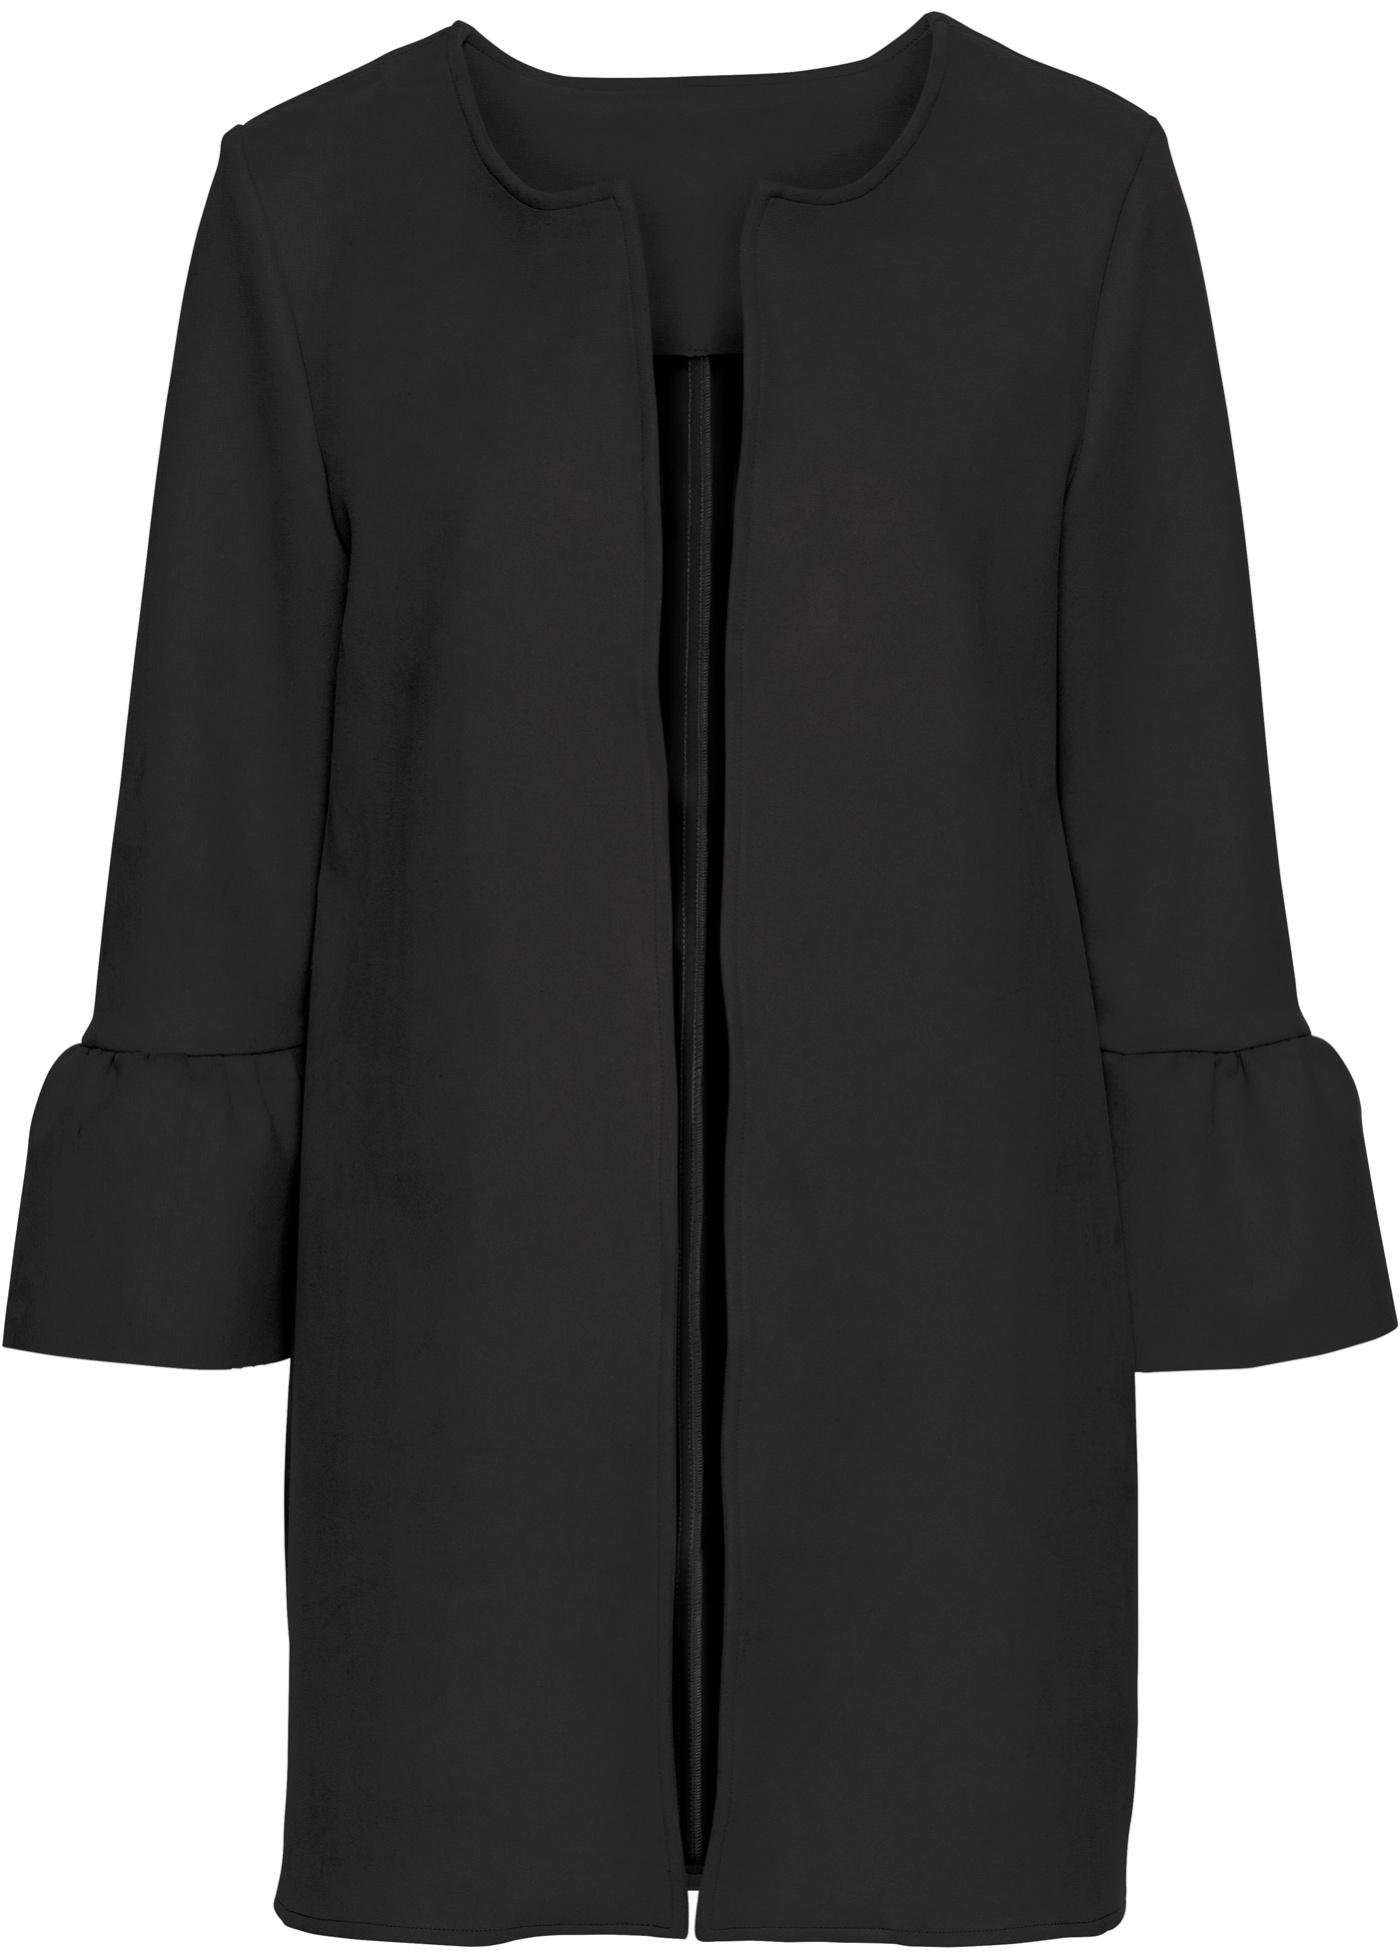 Velourslederimitat-Mantel mit Glockenärmeln jetztbilligerkaufen